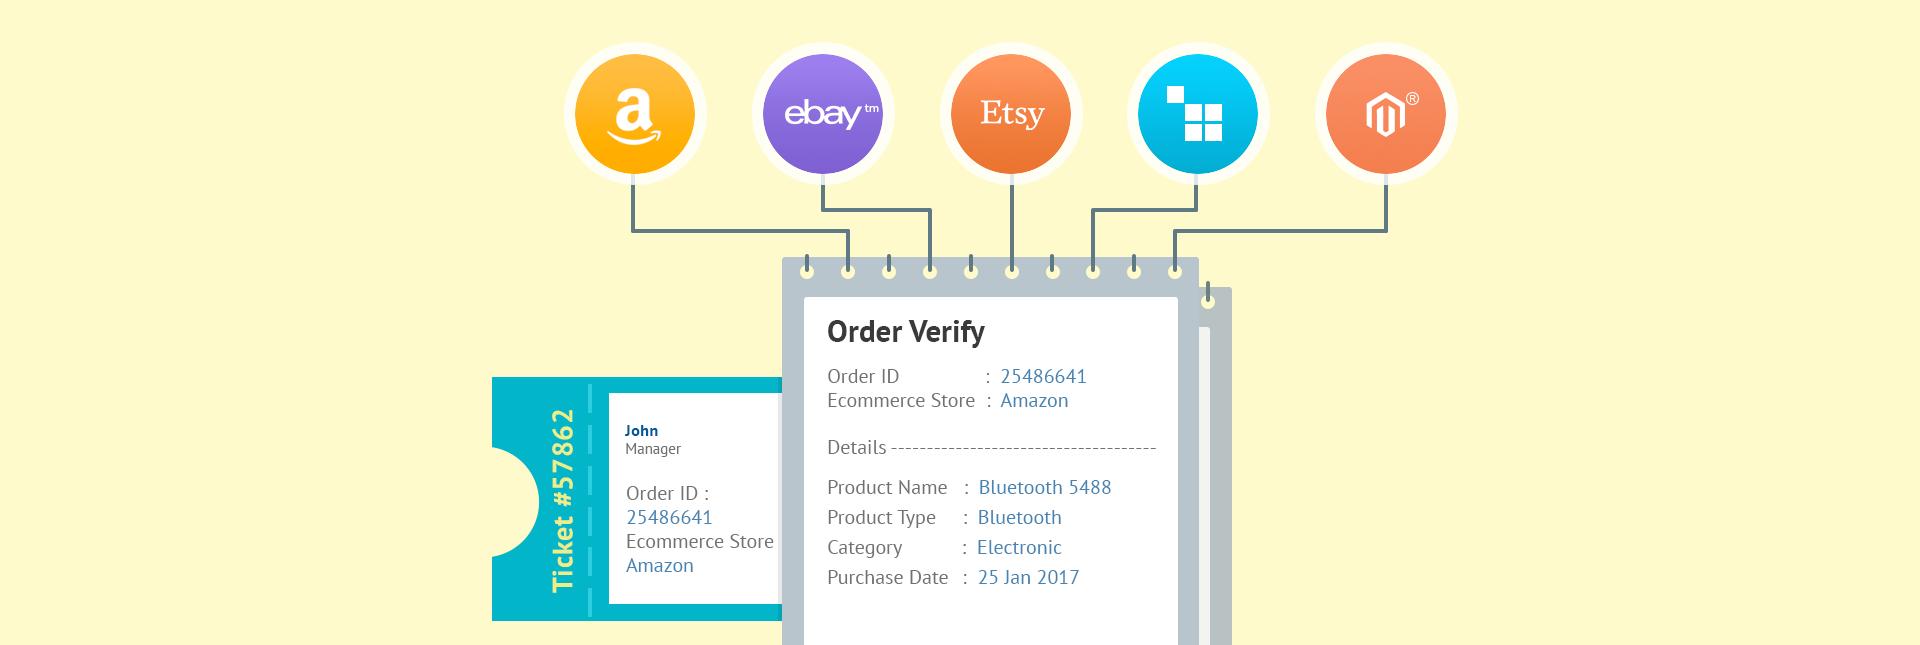 UVdesk Demo - eCommerce App